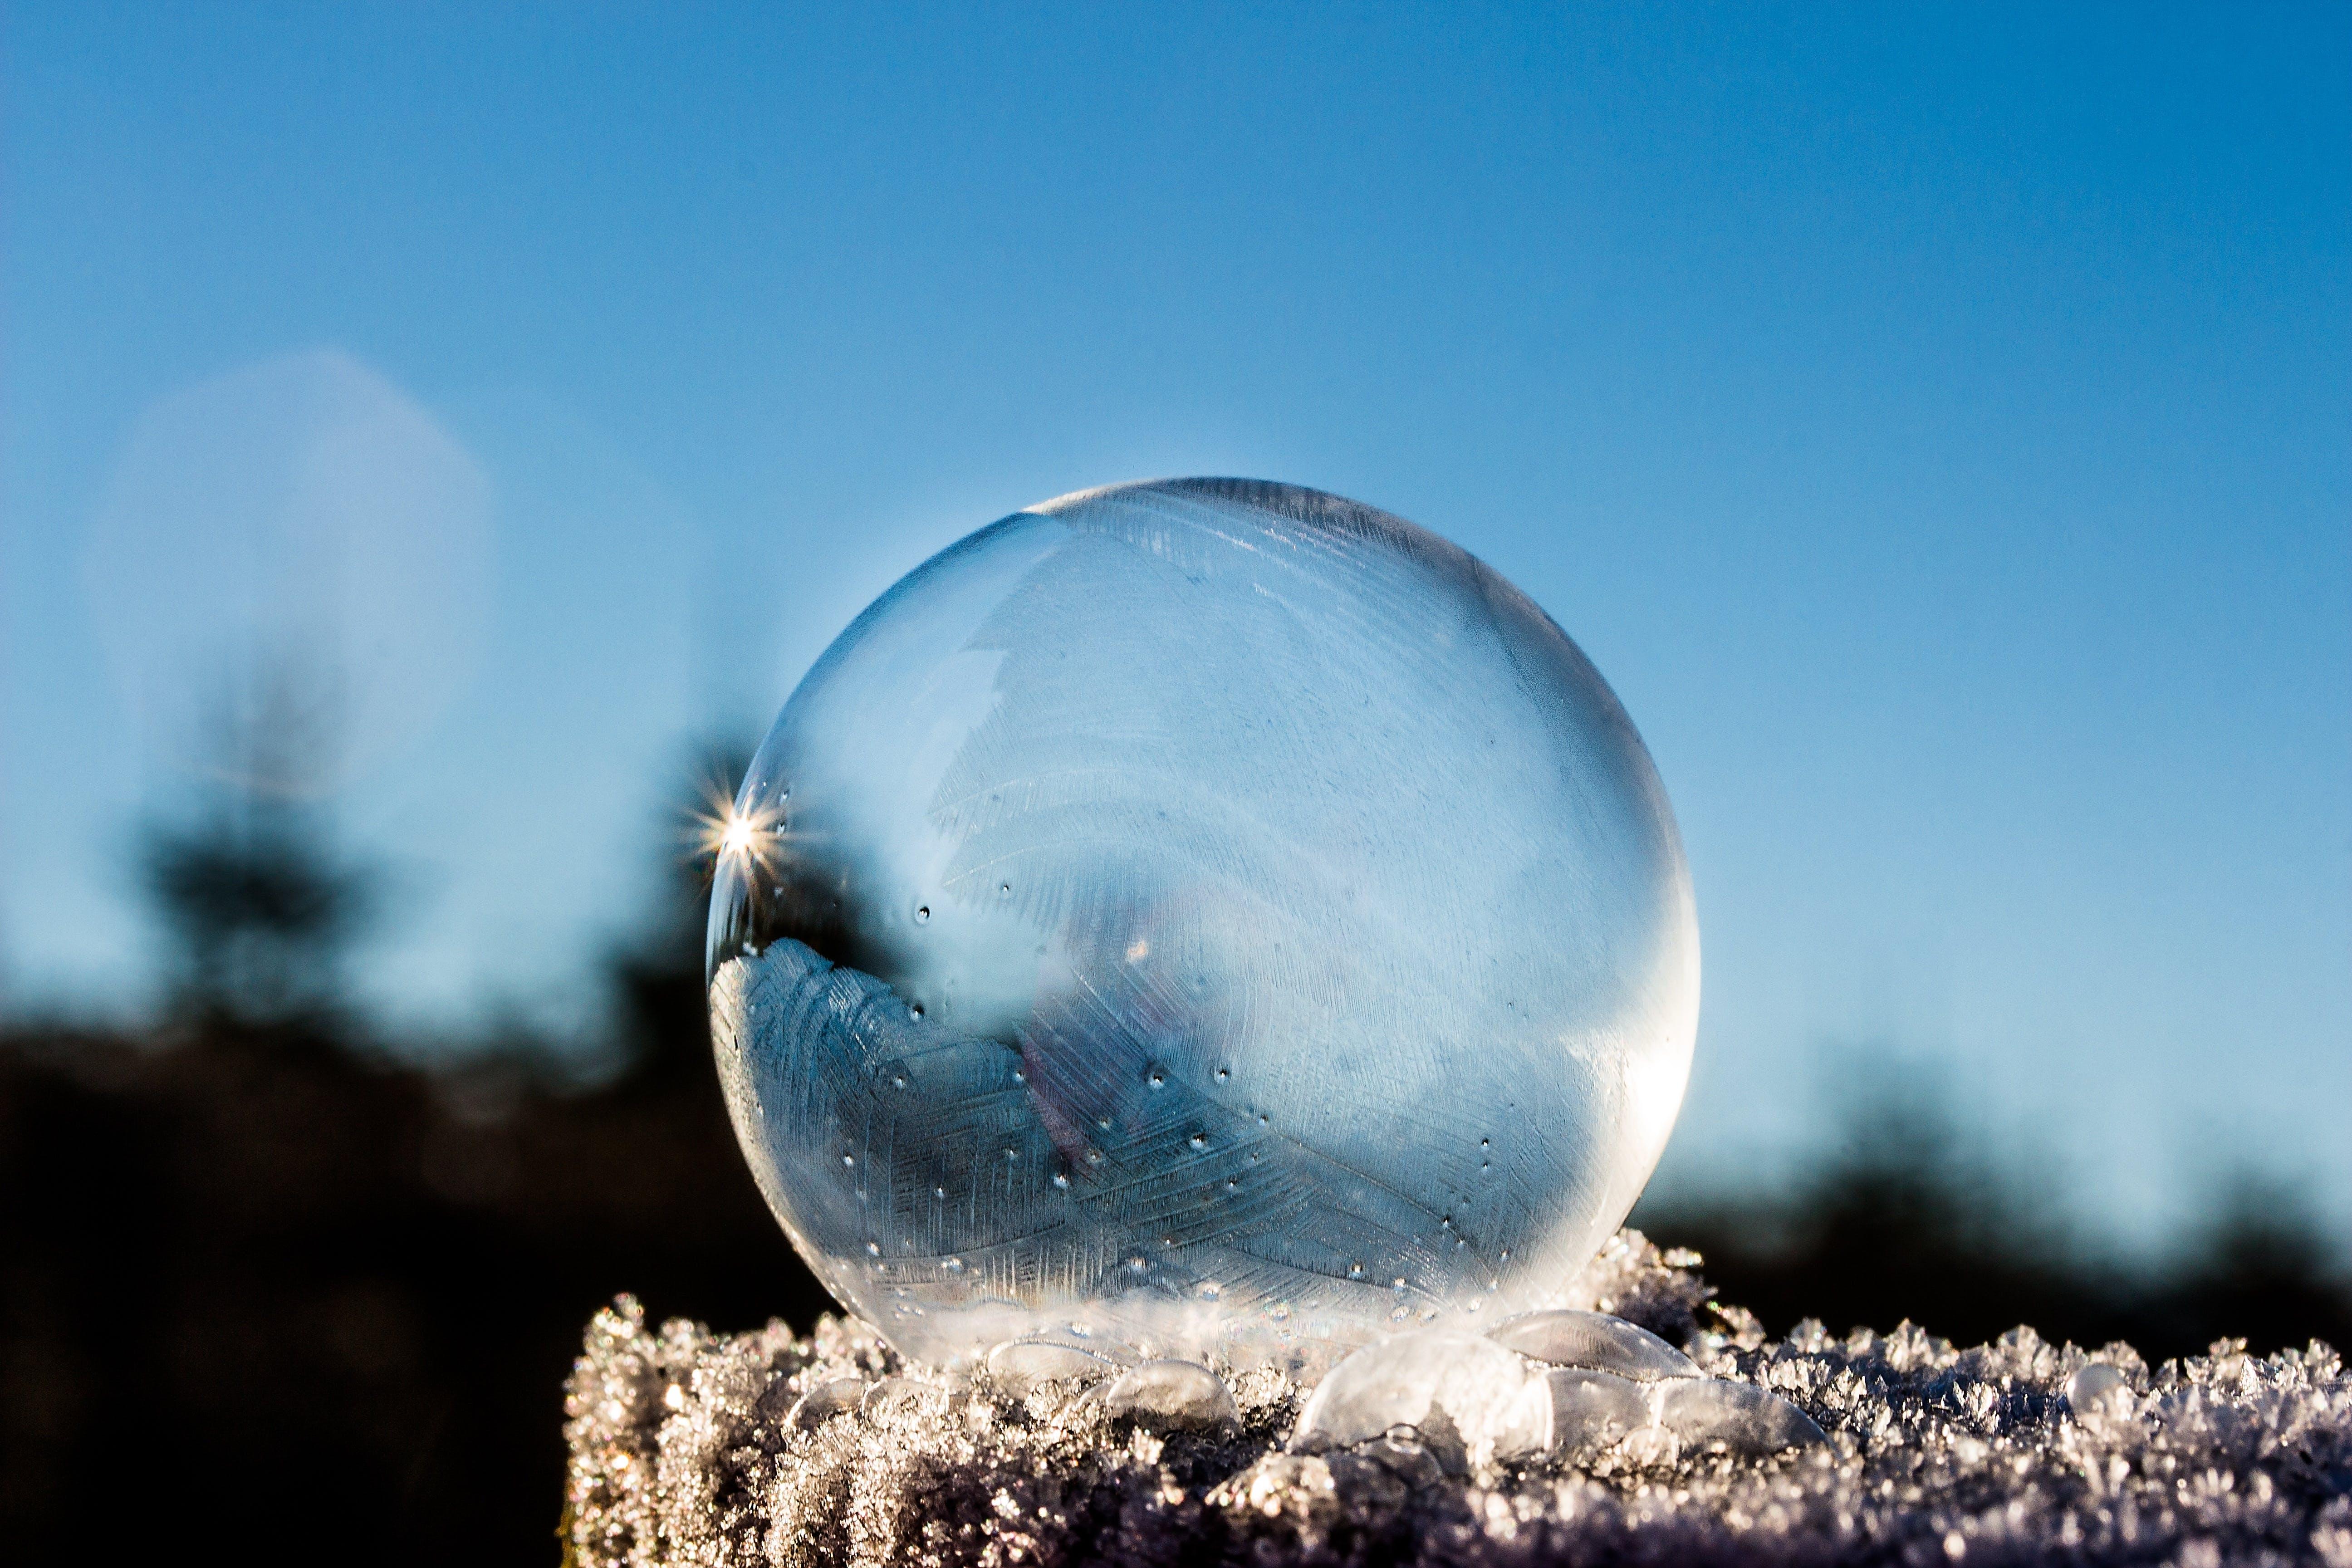 Closeup Water Droplets